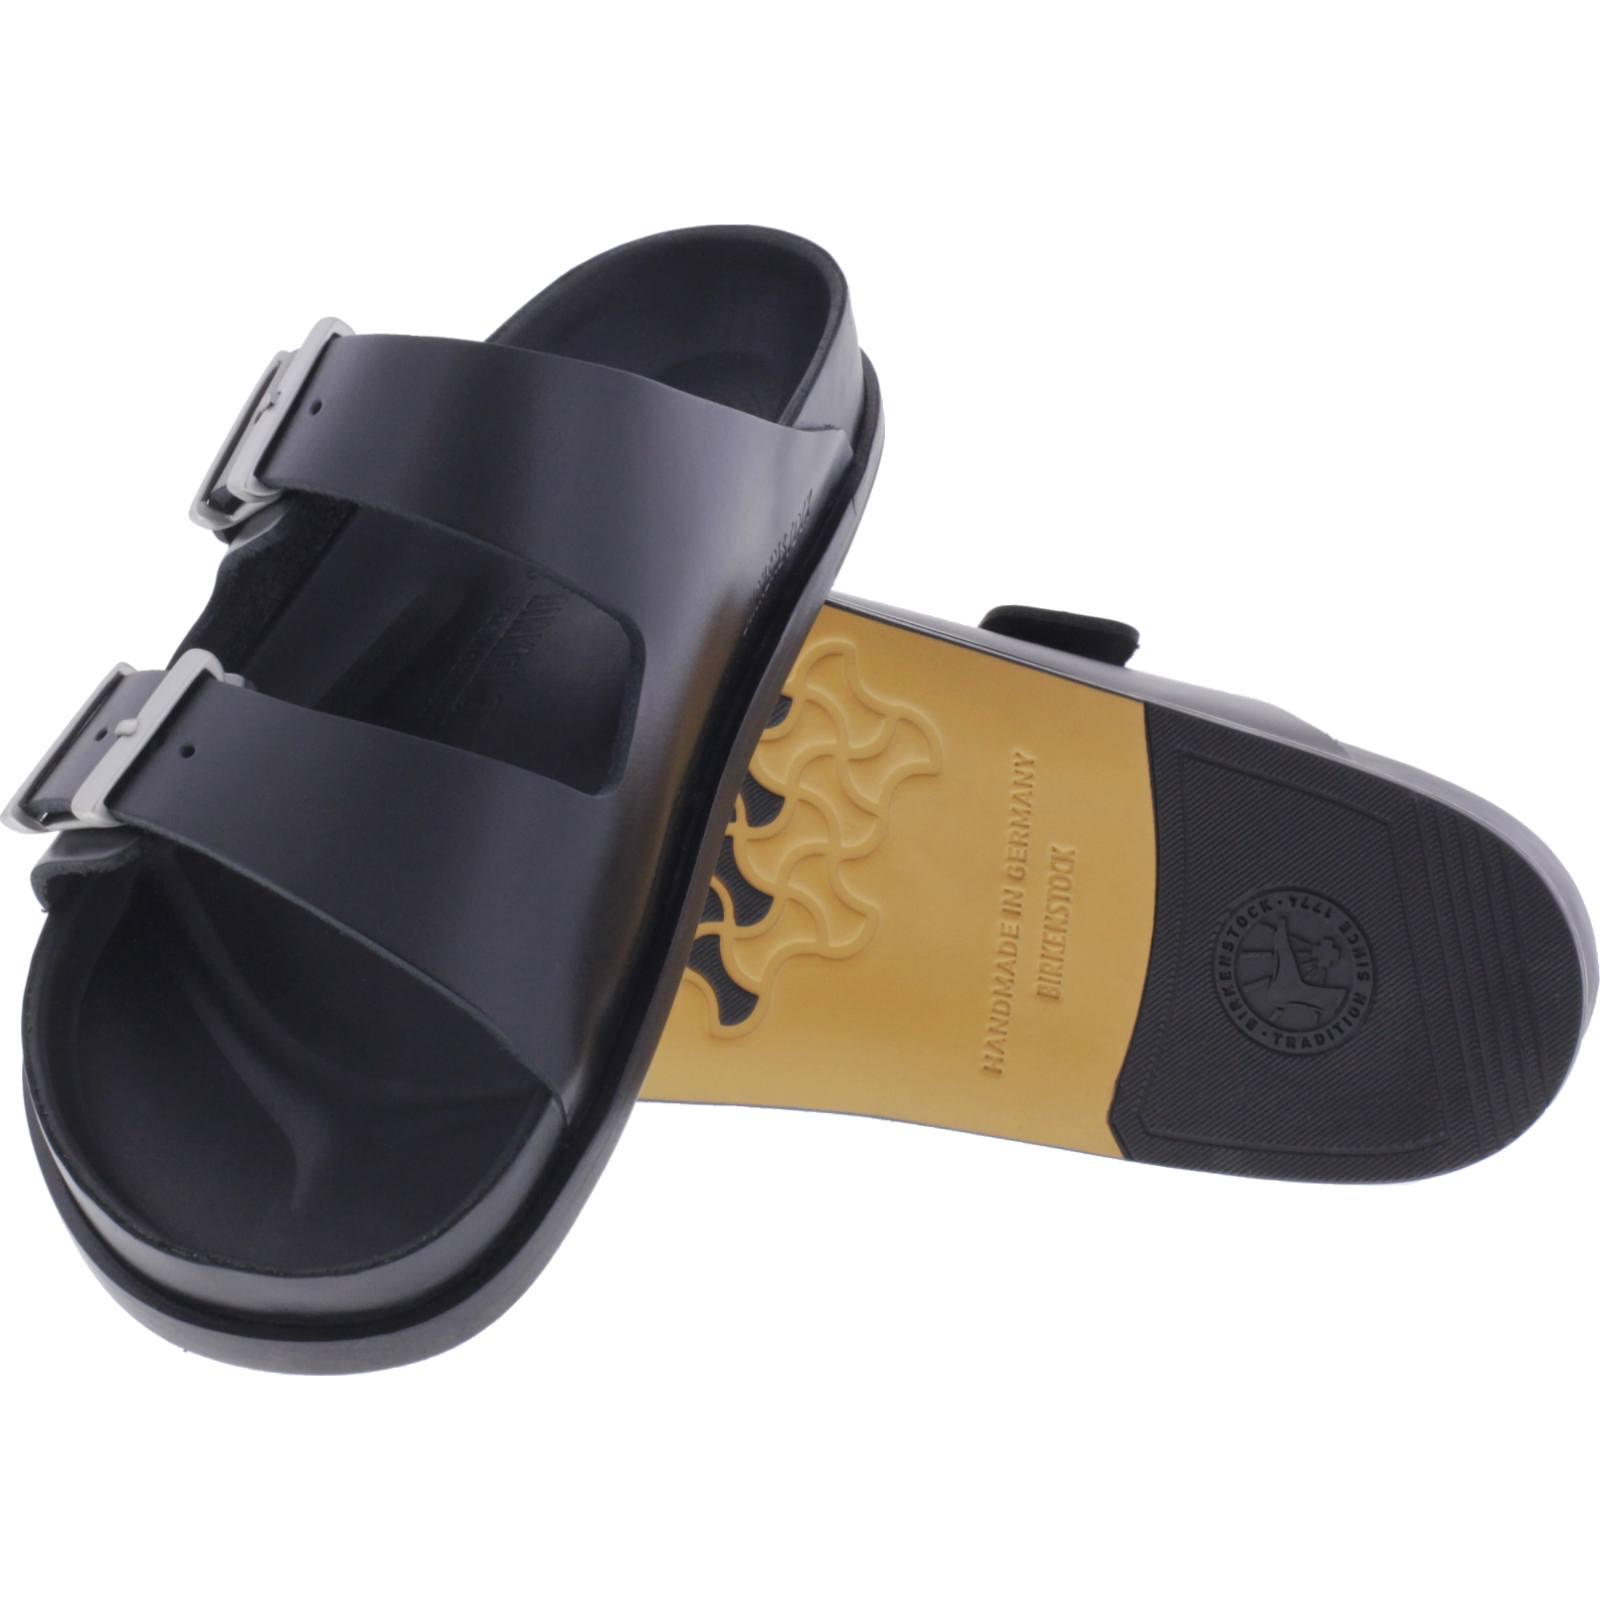 online store 82a6e 15fe1 Birkenstock Premium / Modell: Arizona Premium / Schwarz Naturleder / Weite:  Normal / Art: 1008953